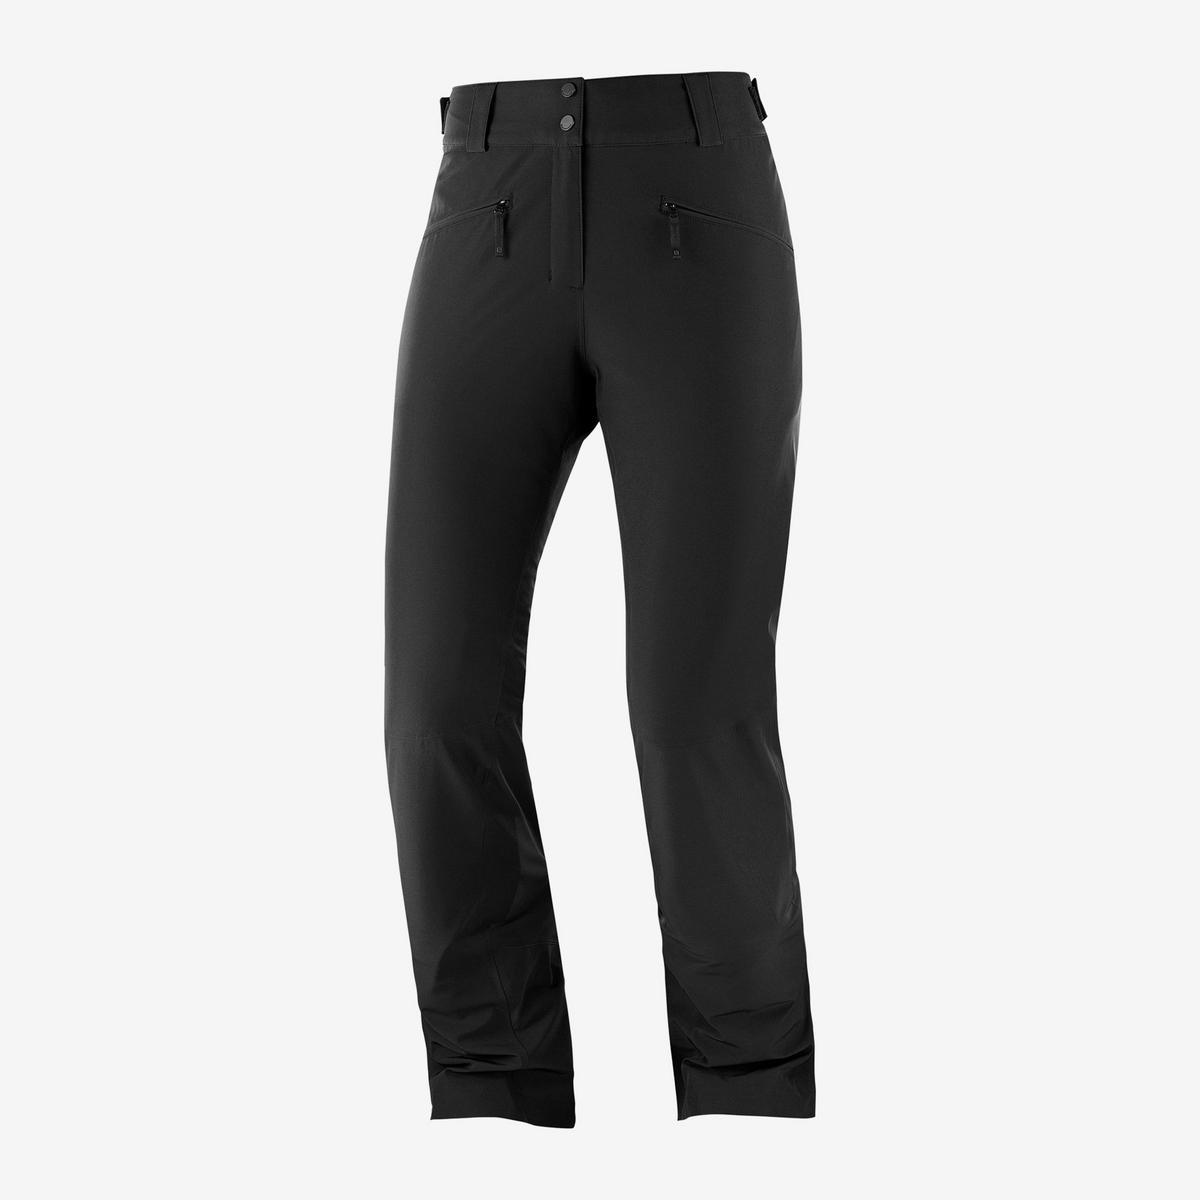 Salomon Women's Edge Pant - Black